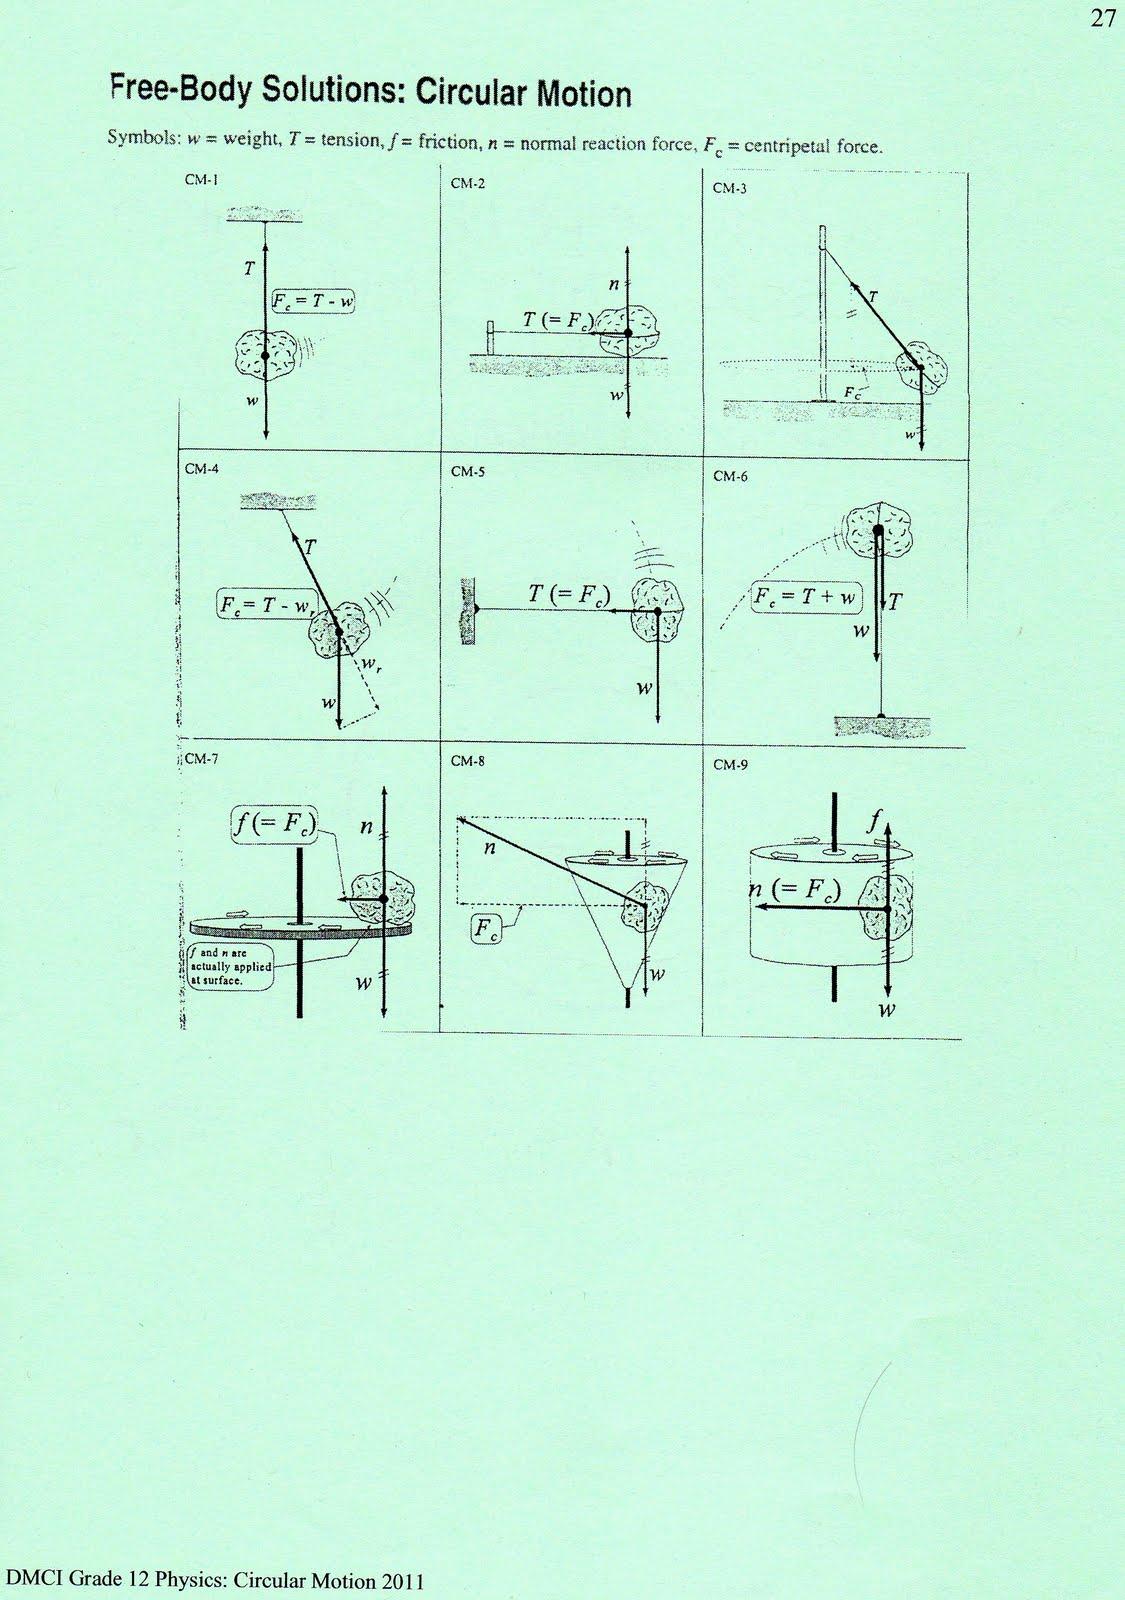 Physics1202-2010: Circular motion